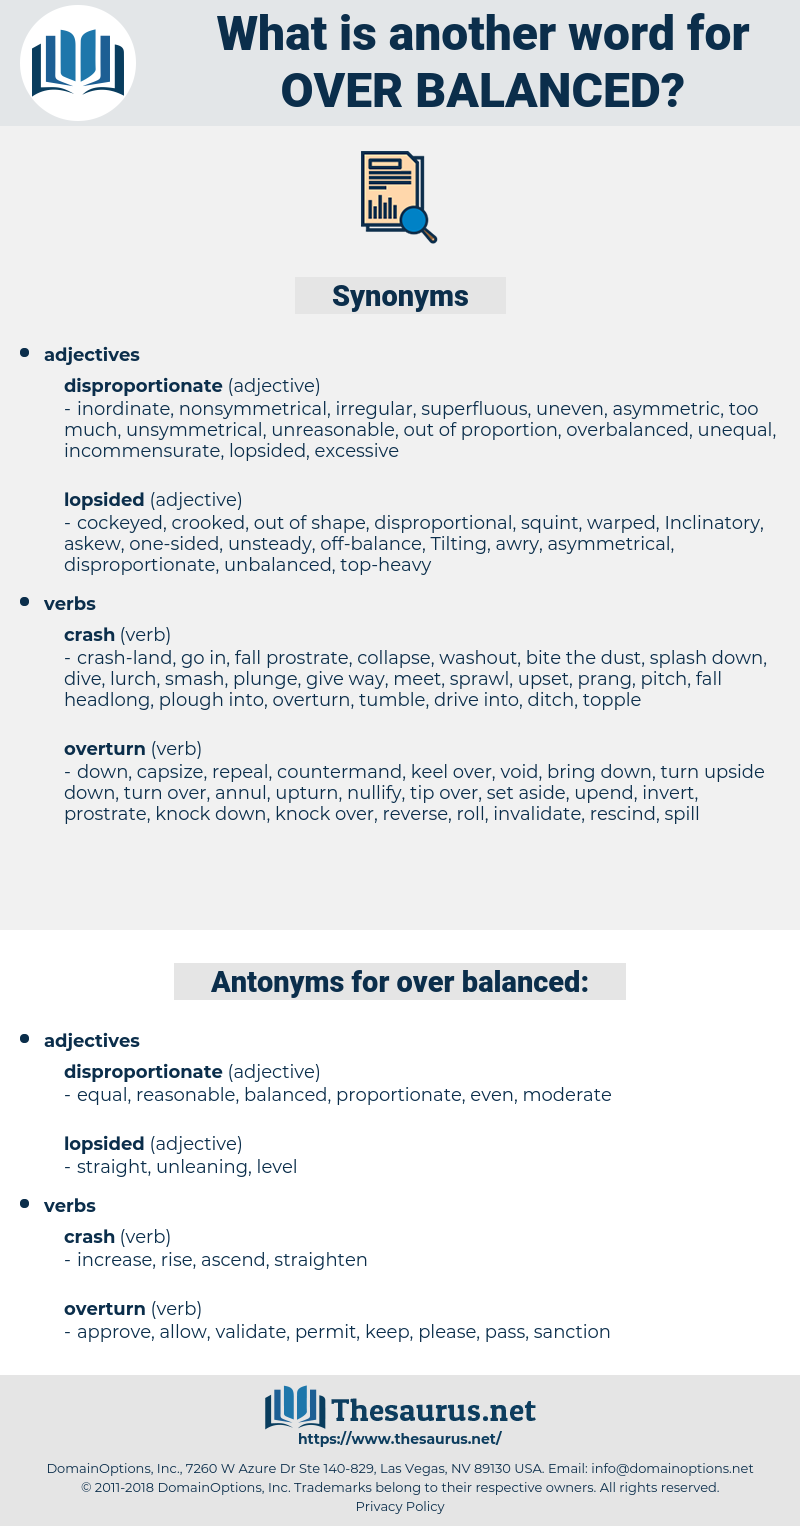 over-balanced, synonym over-balanced, another word for over-balanced, words like over-balanced, thesaurus over-balanced